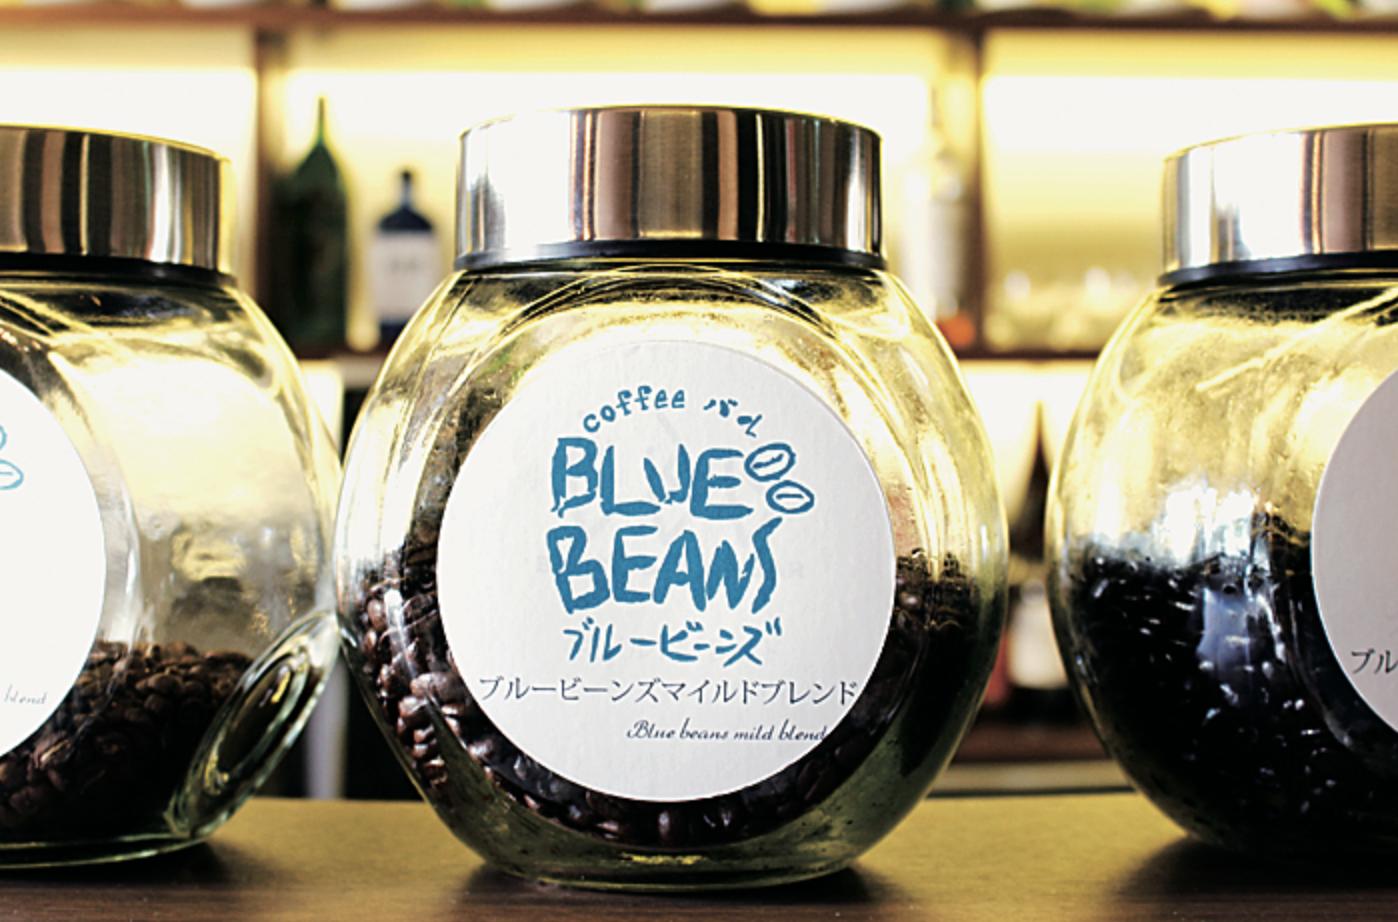 BLUE BEANS